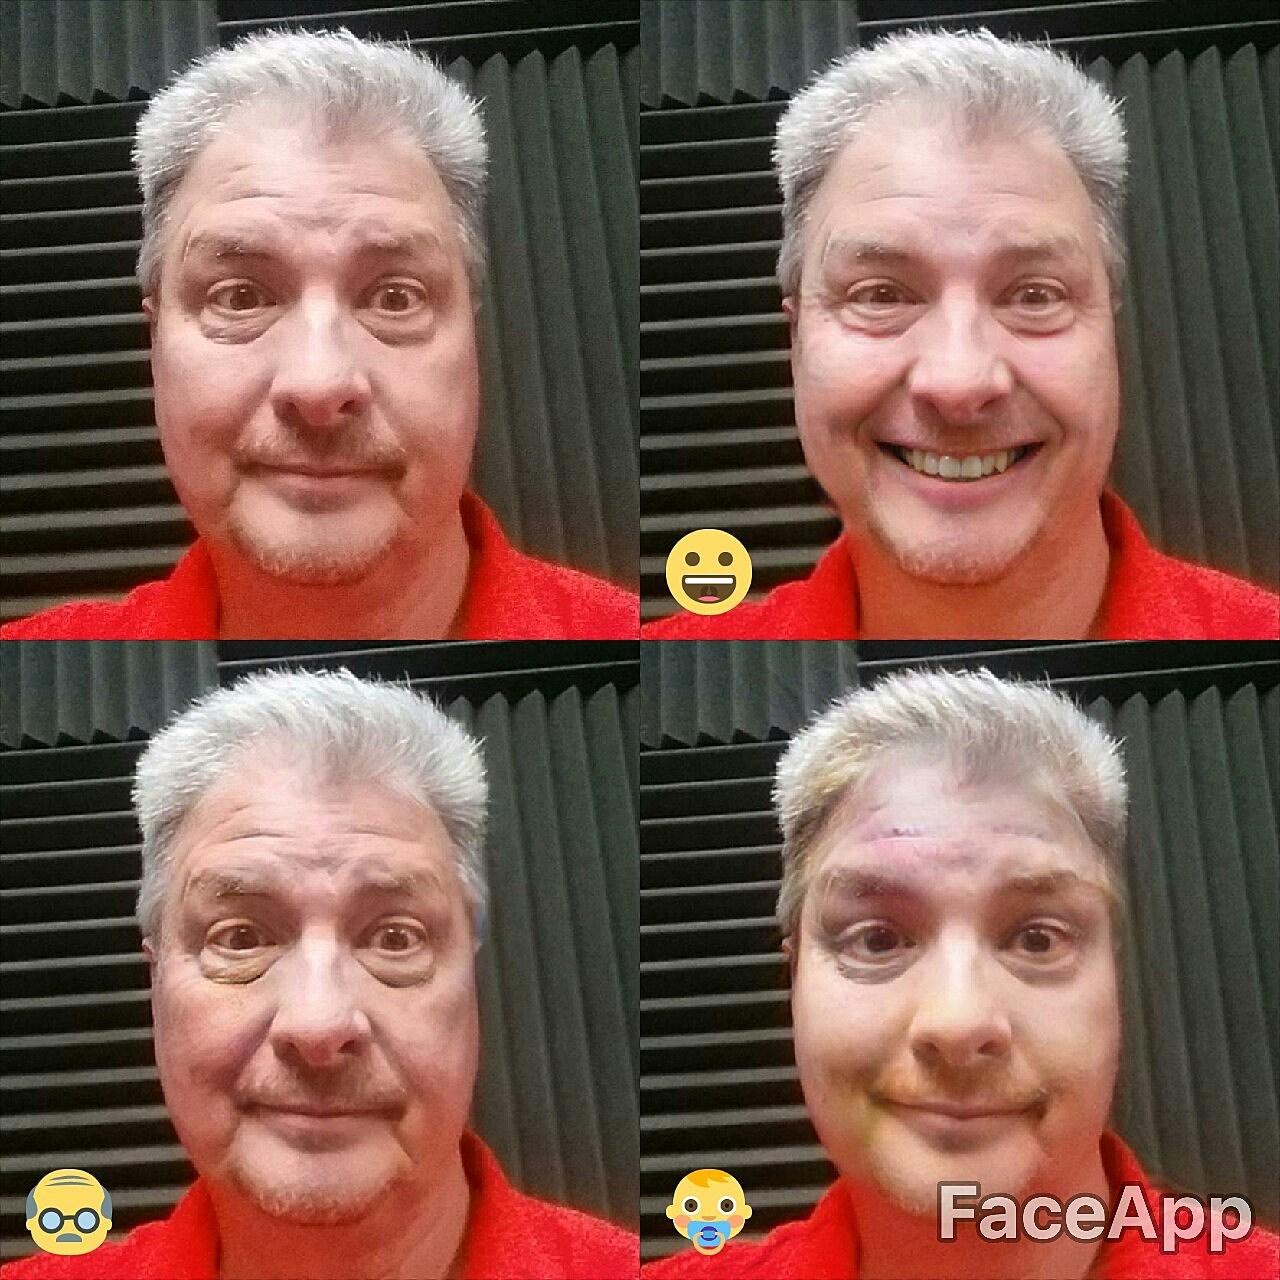 Face App Collage - Jim Weaver